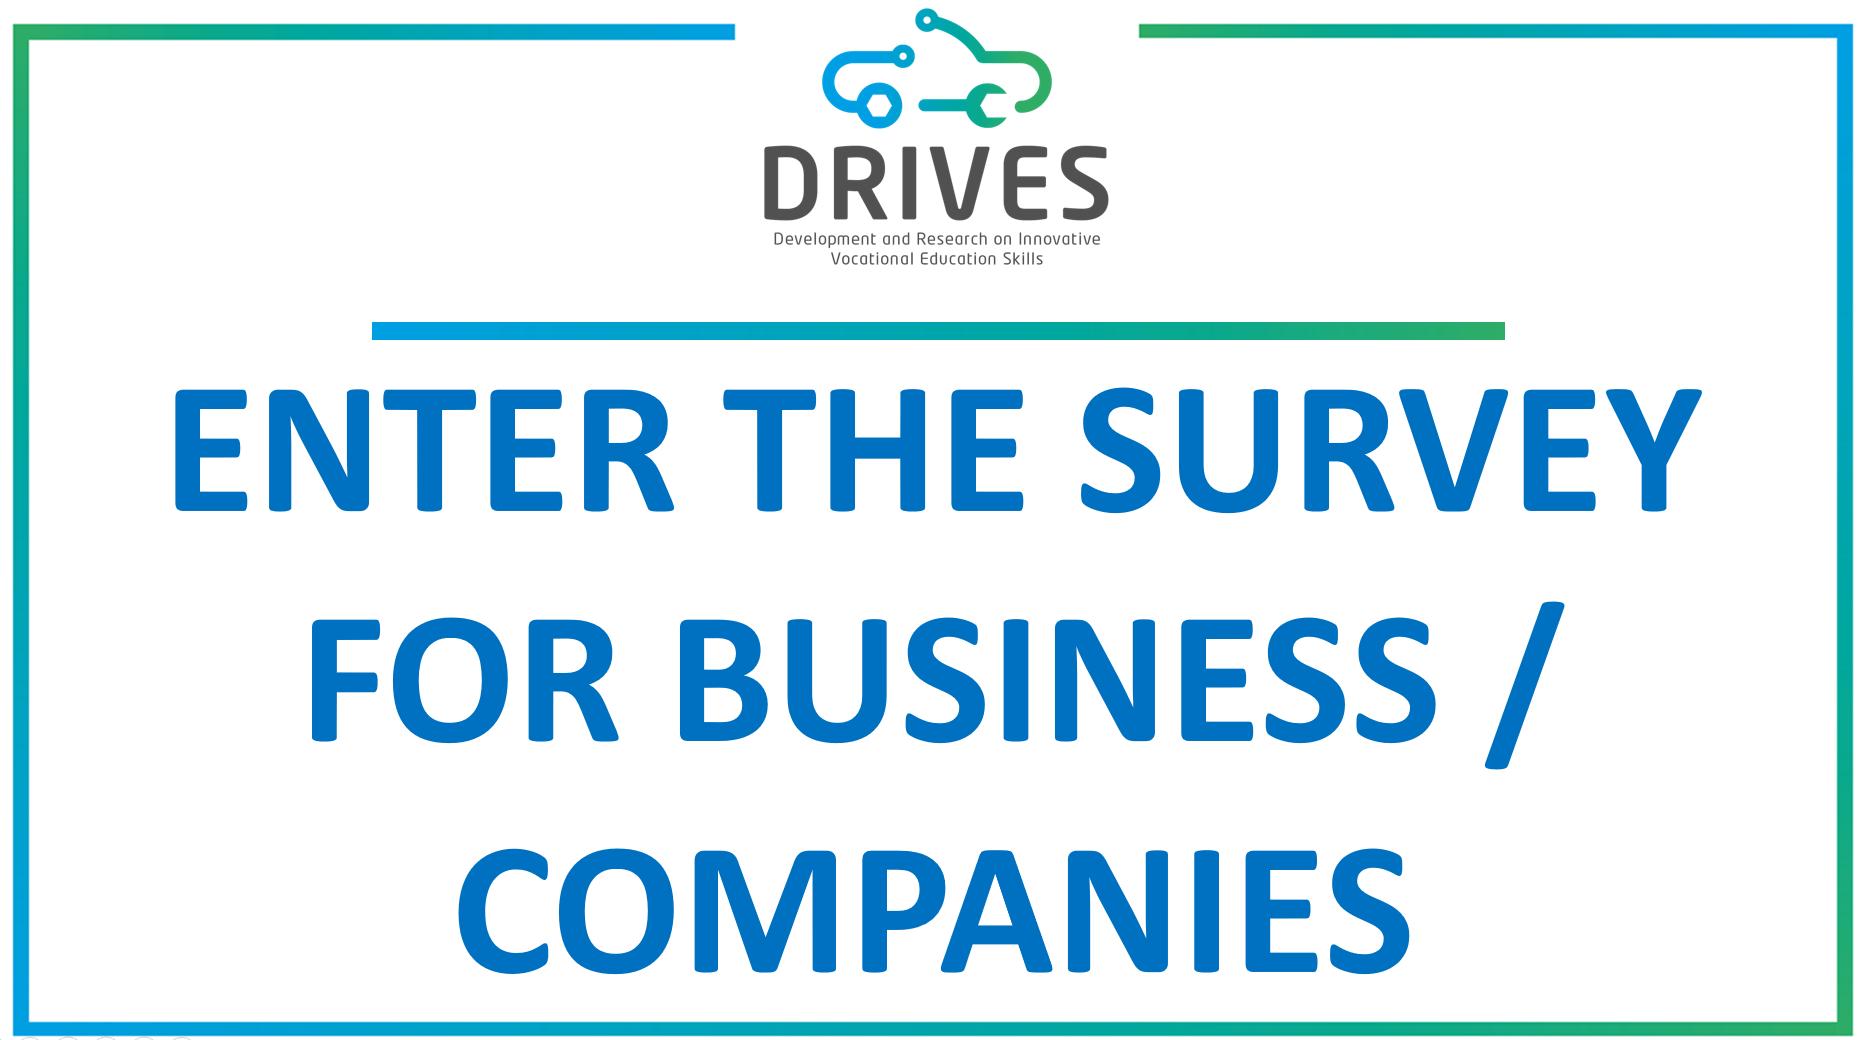 Business/Companies: Small and Medium Enterprises, Large Enterprises